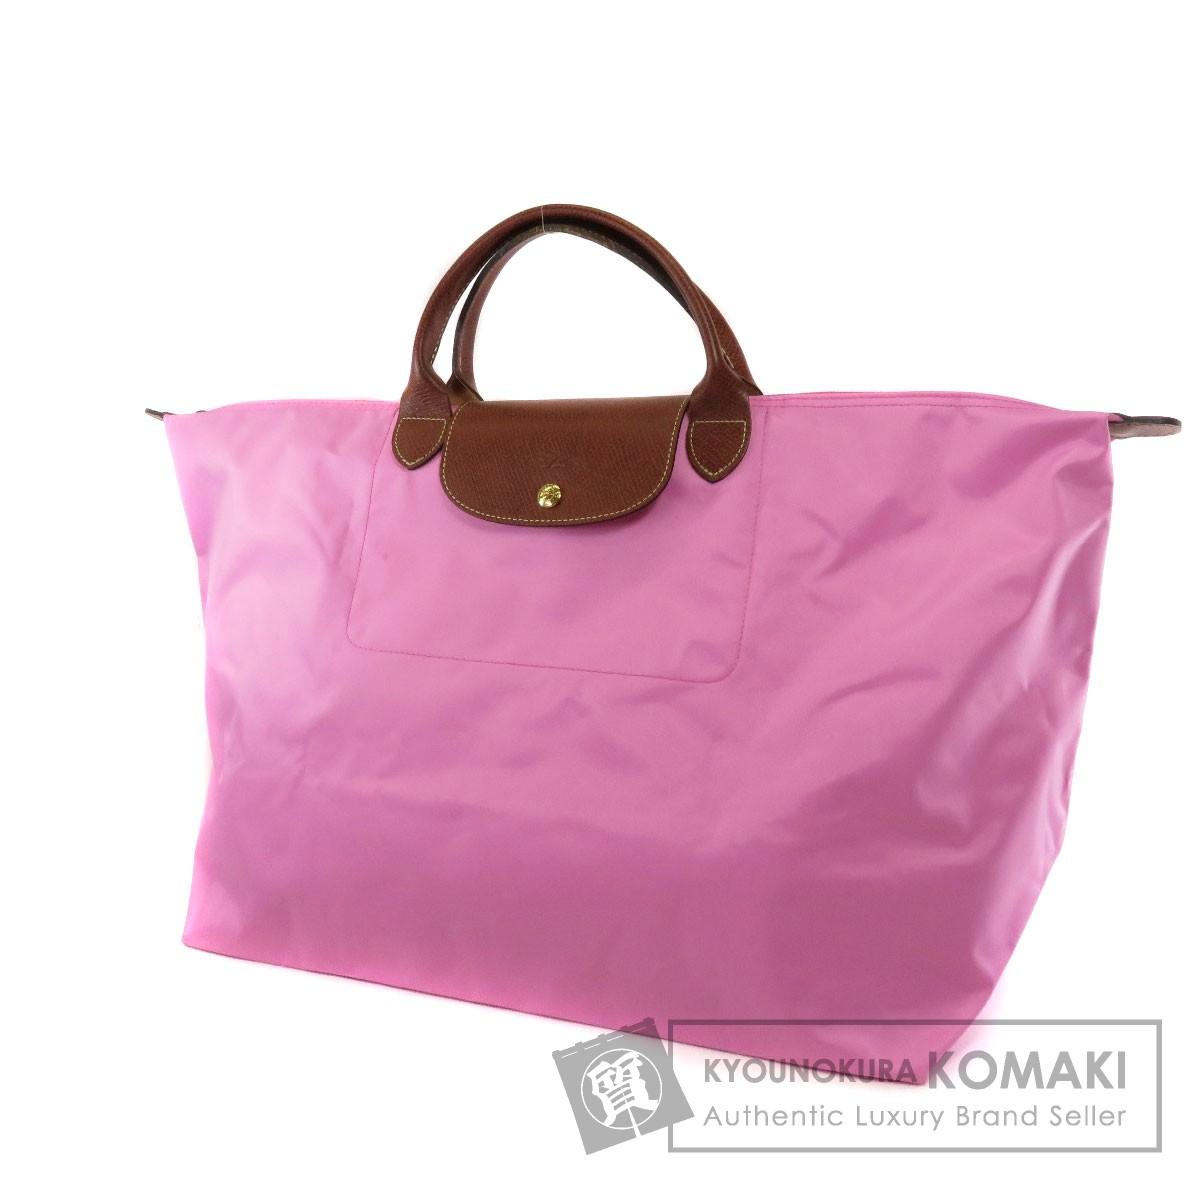 Longchamp ル・プリアージュ ハンドバッグ ナイロン素材 レディース 【中古】【ロンシャン】